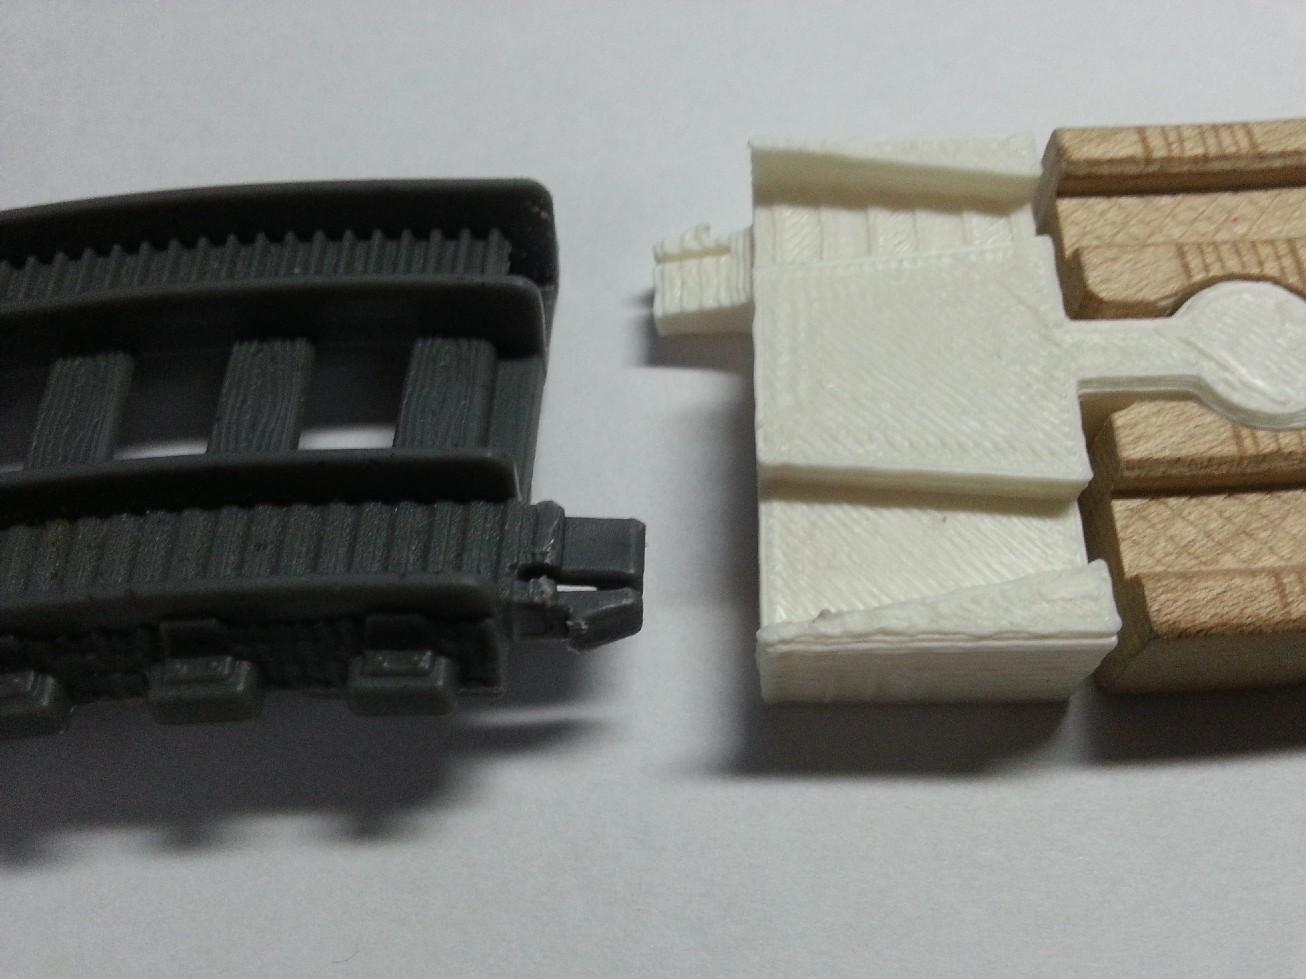 New Motorized Trackmaster Adapter Plastic To Wood Thomas Battery Track Mf Set X2